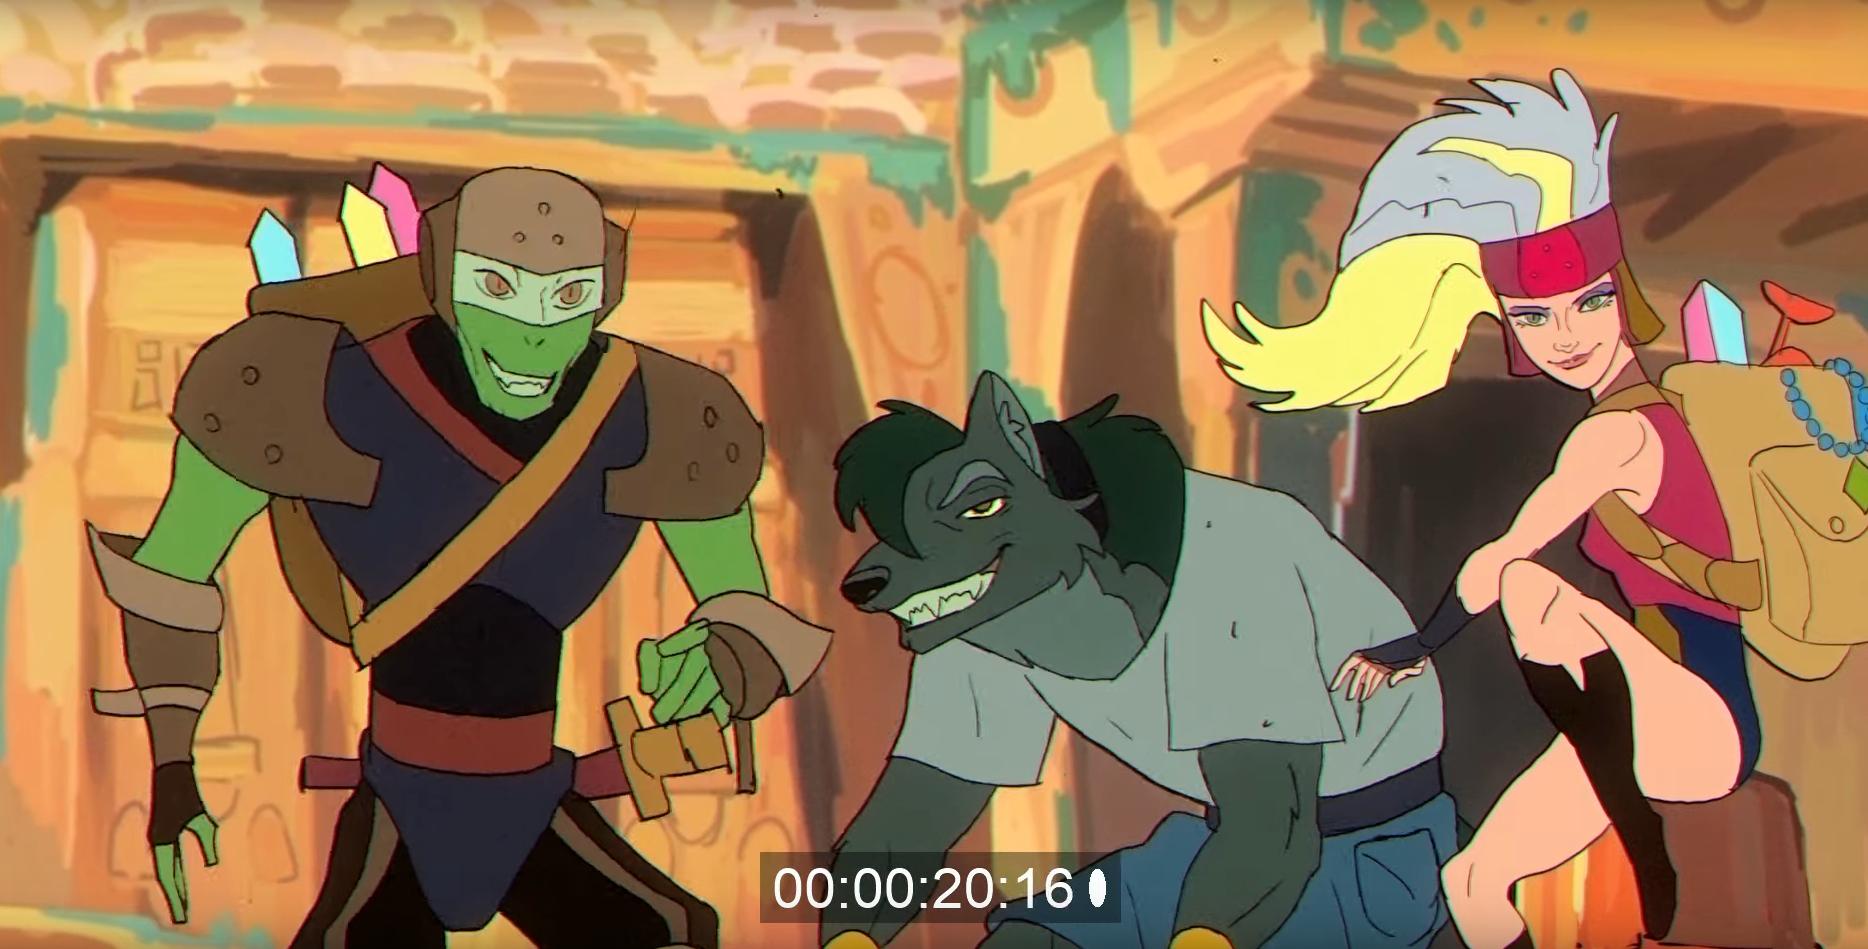 Короткометражка: Dream Bandits — трейлер фэнтези мультсериала в духе 90-х 3